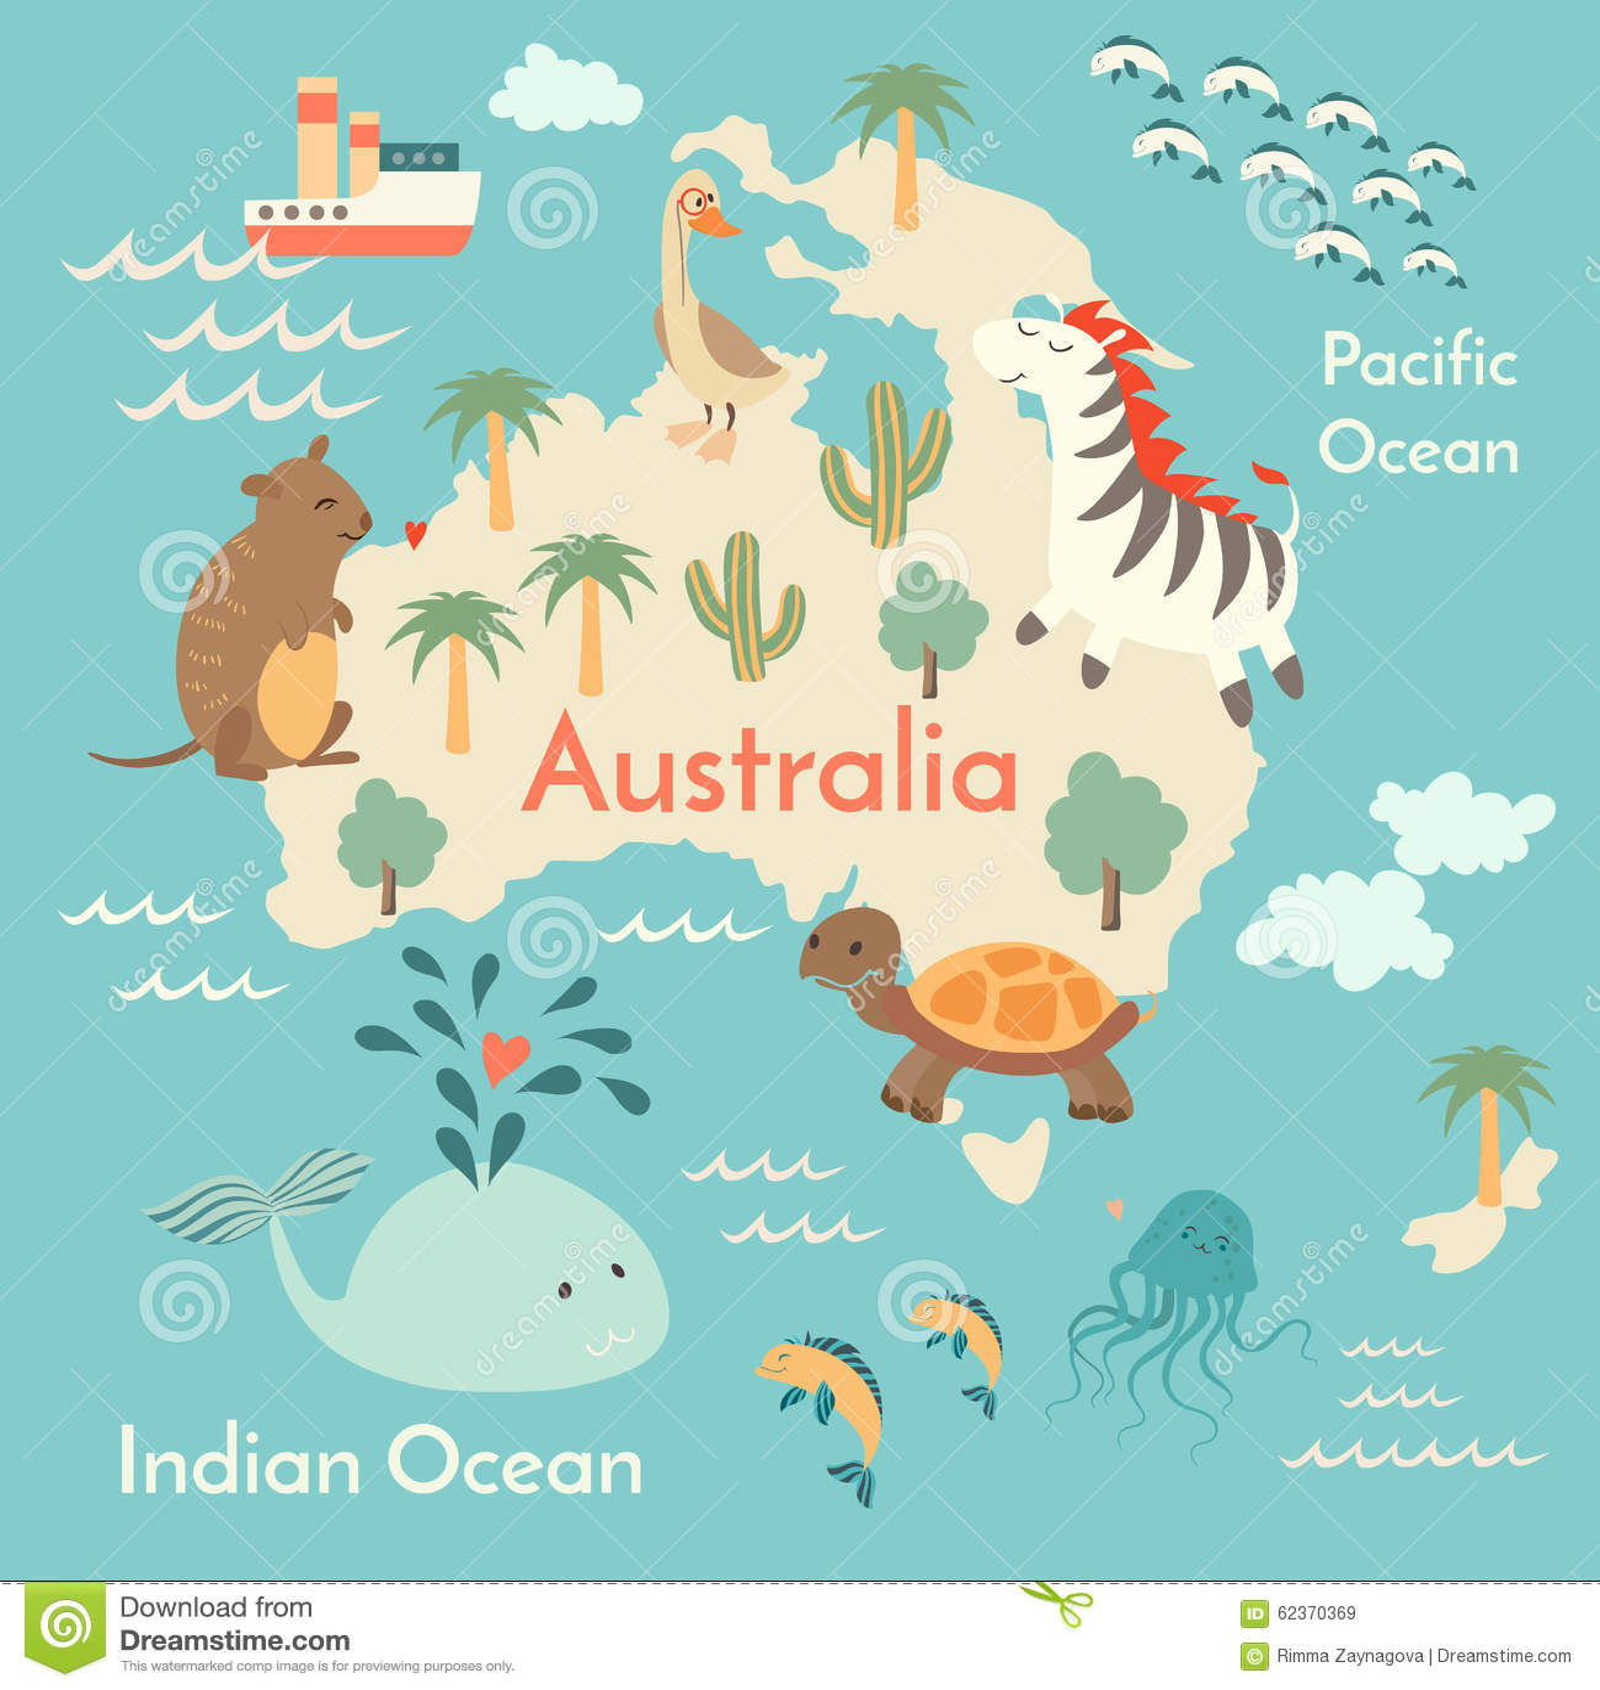 Animals World Map Australia Vector Image 62370369 – Map of Australia in the World